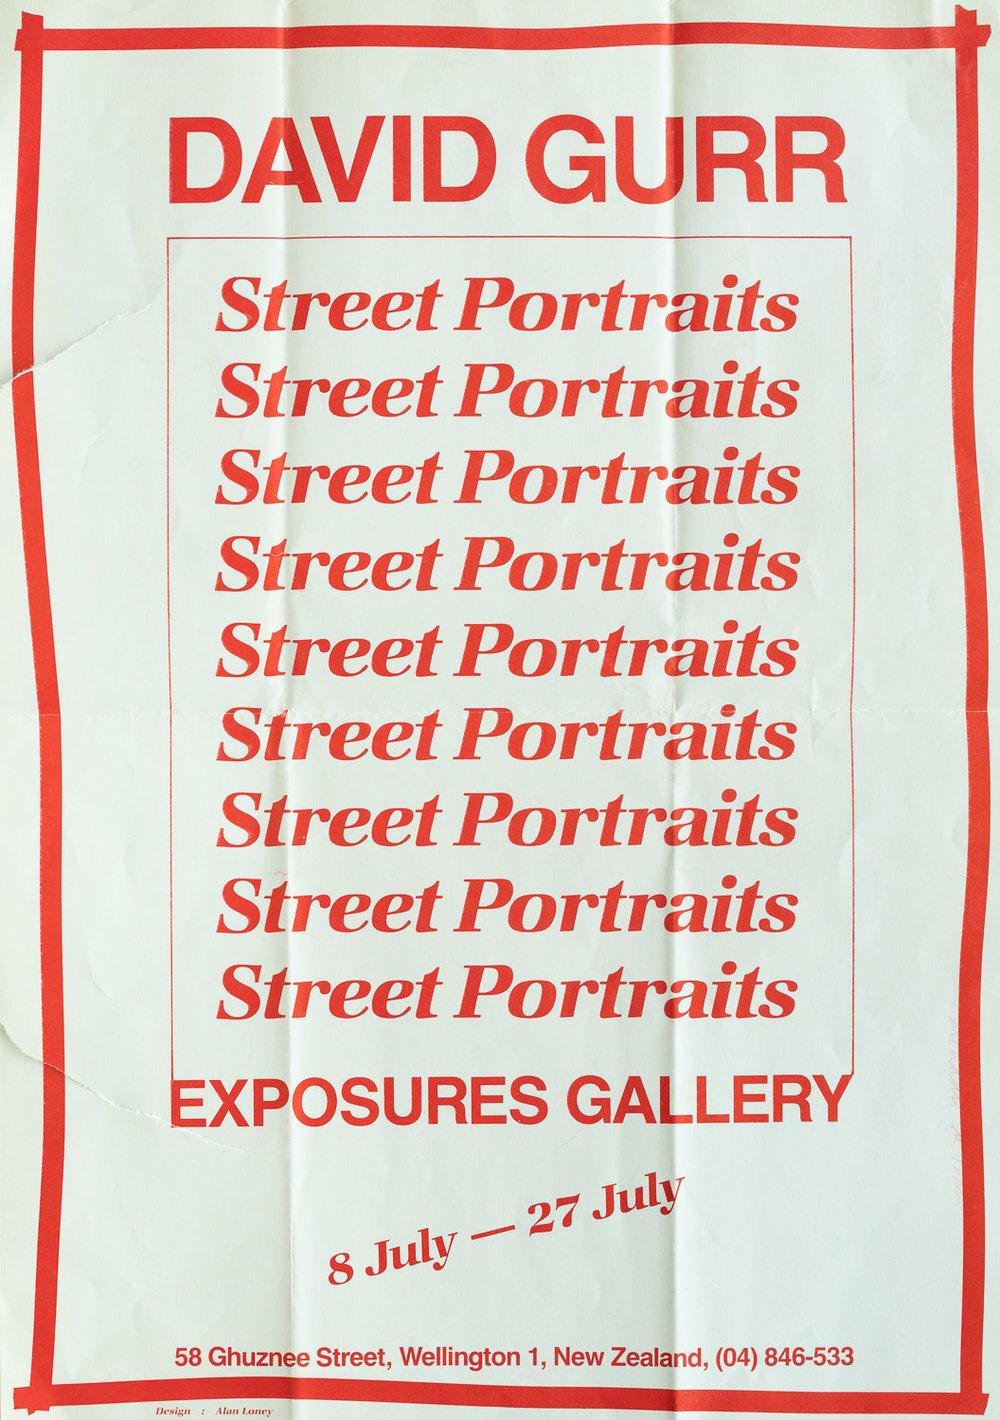 David GurrStreet Portraits8 – 27 July, 1985. Design by Alan Loney